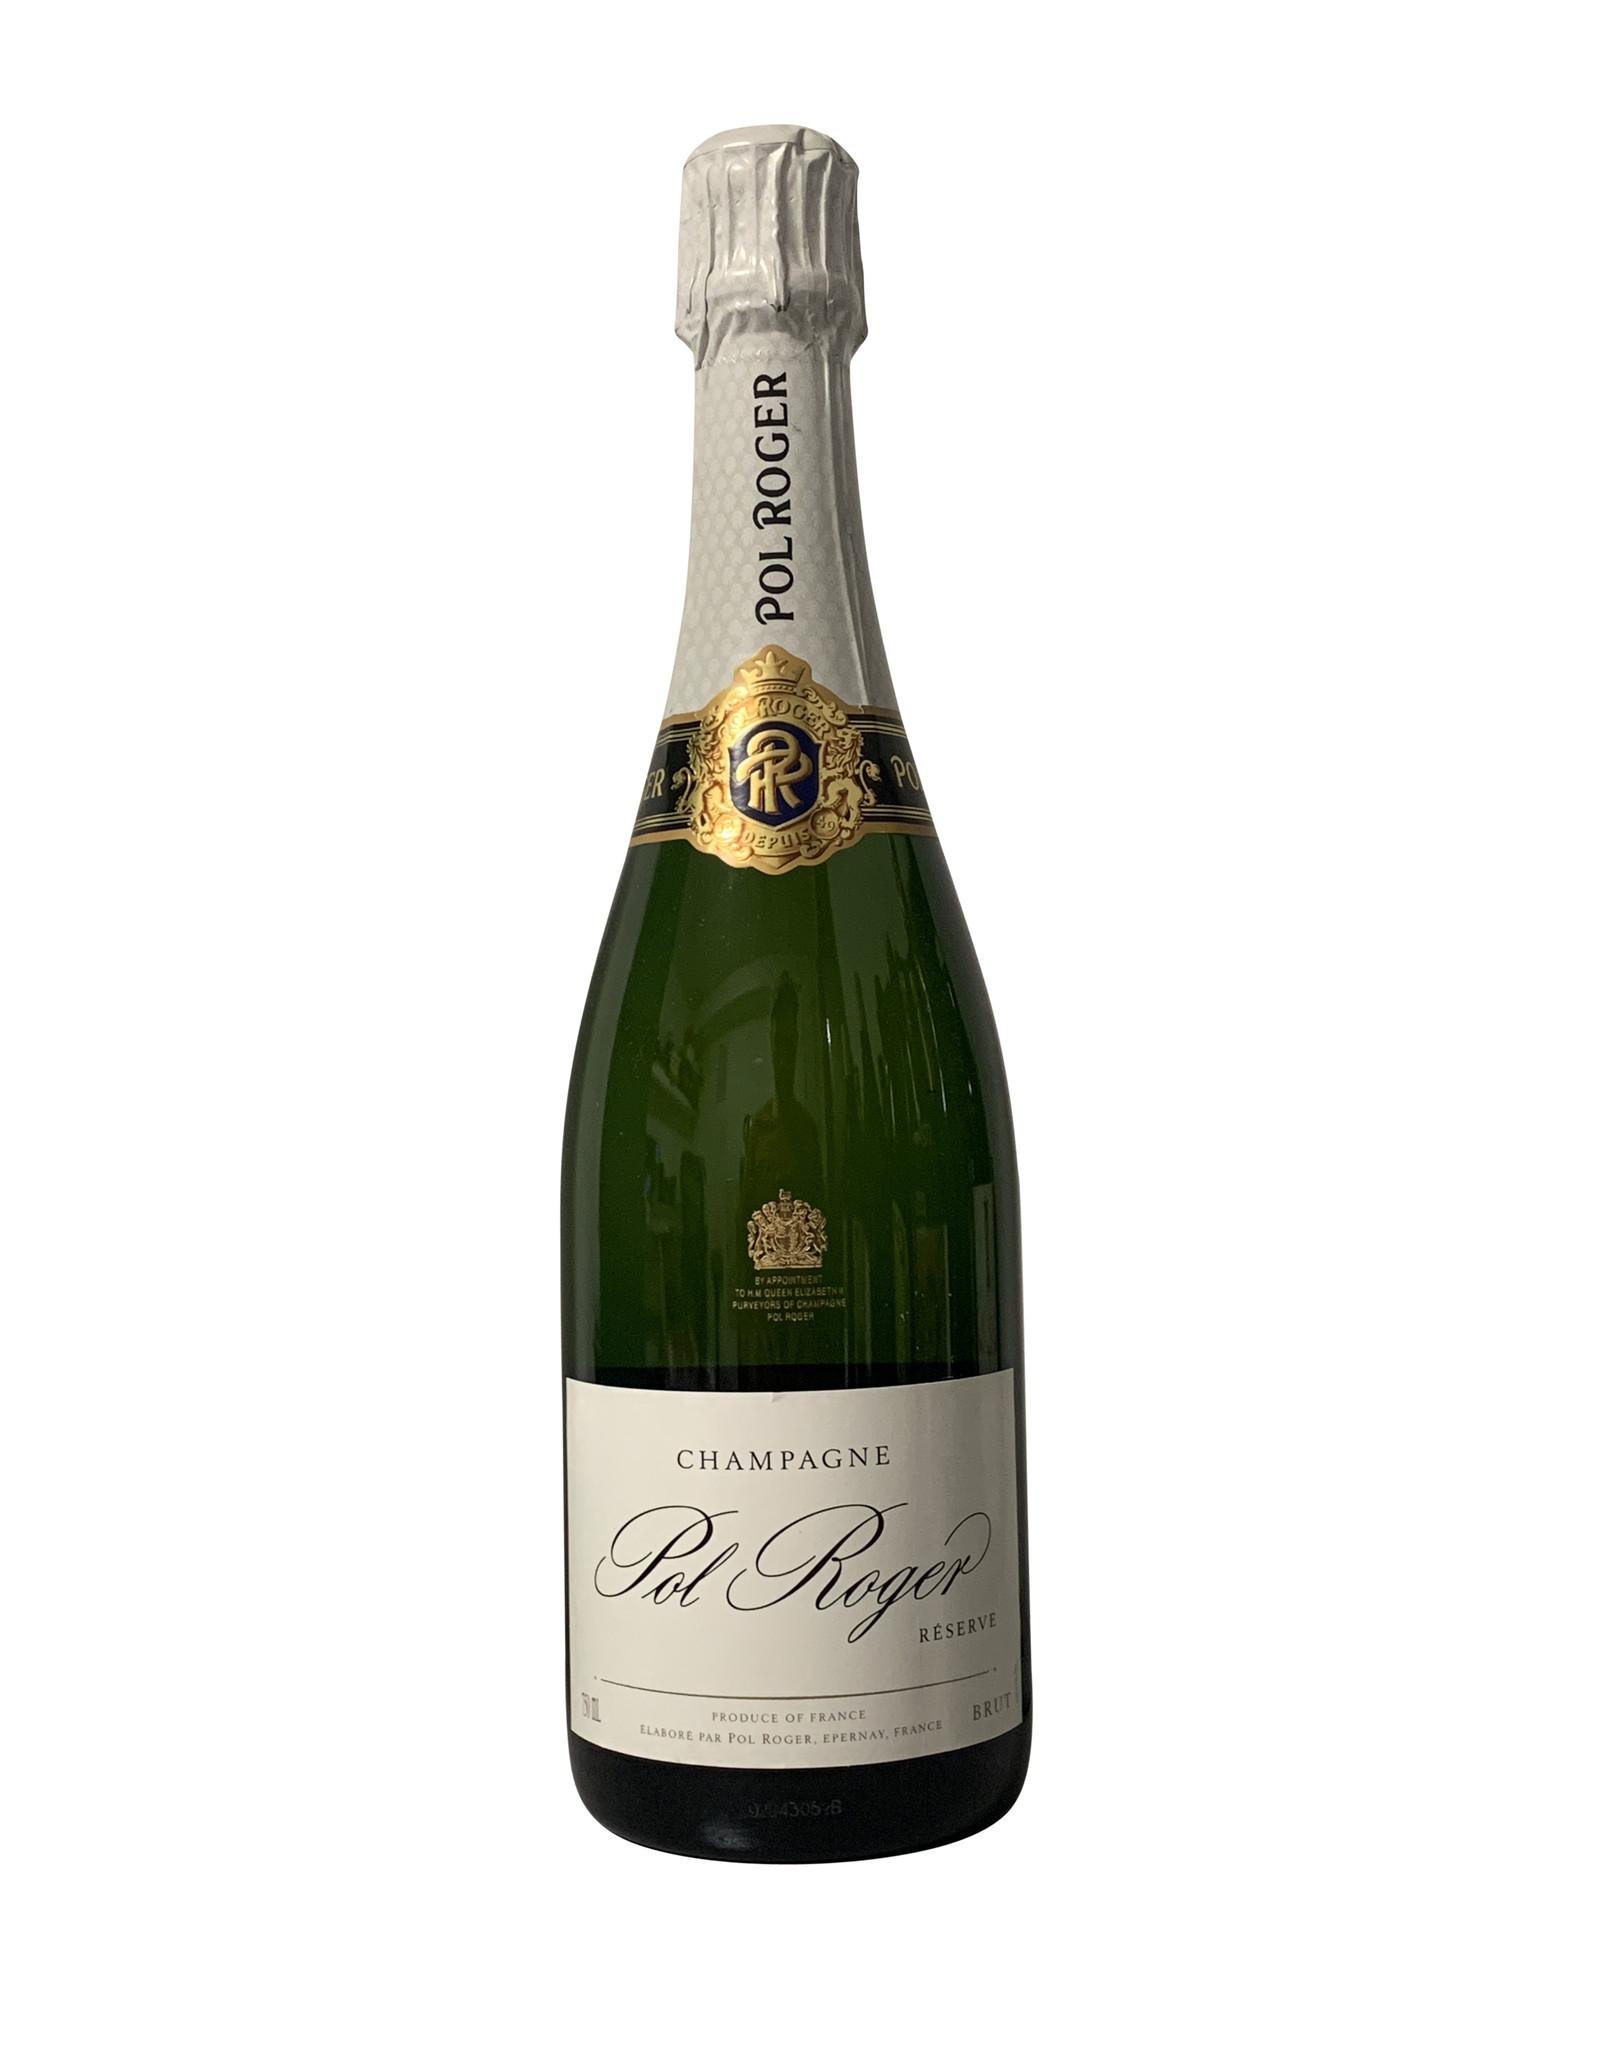 Pol Roger Pol Roger Champagne Brut NV, Champagne, France (750mL)